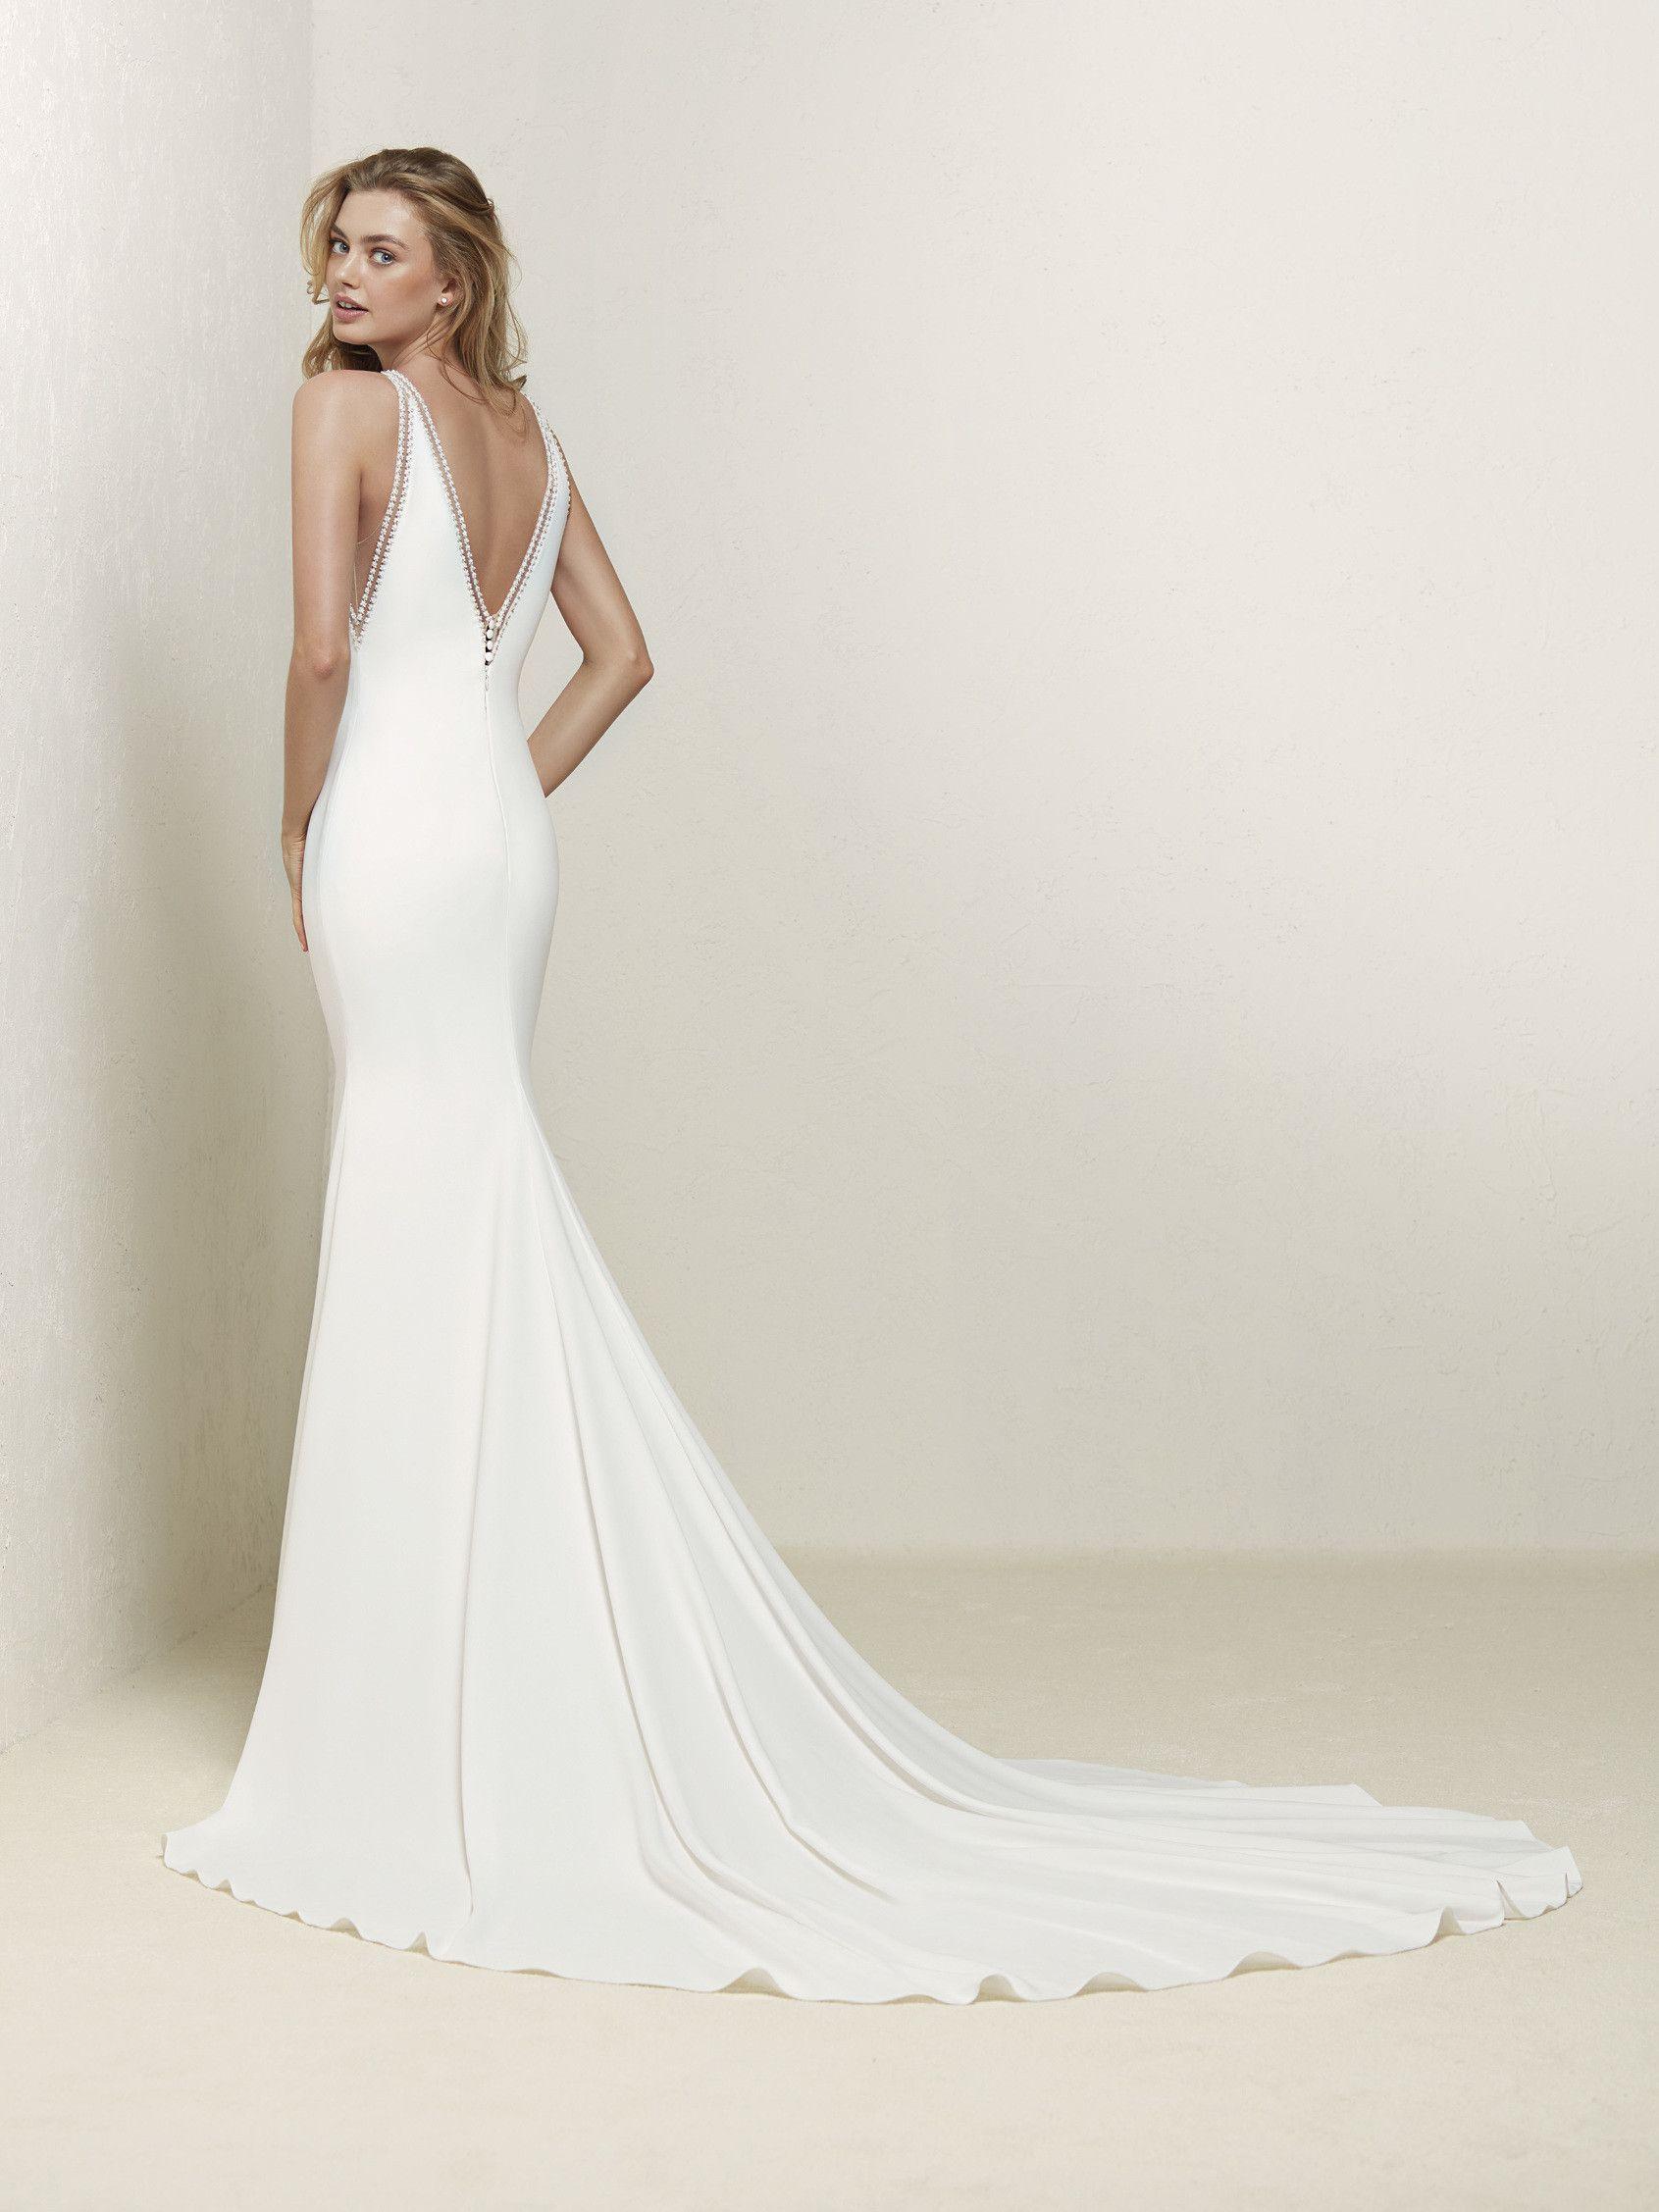 Vestido de novia sirena encaje | BRIDE - ONE | Pinterest